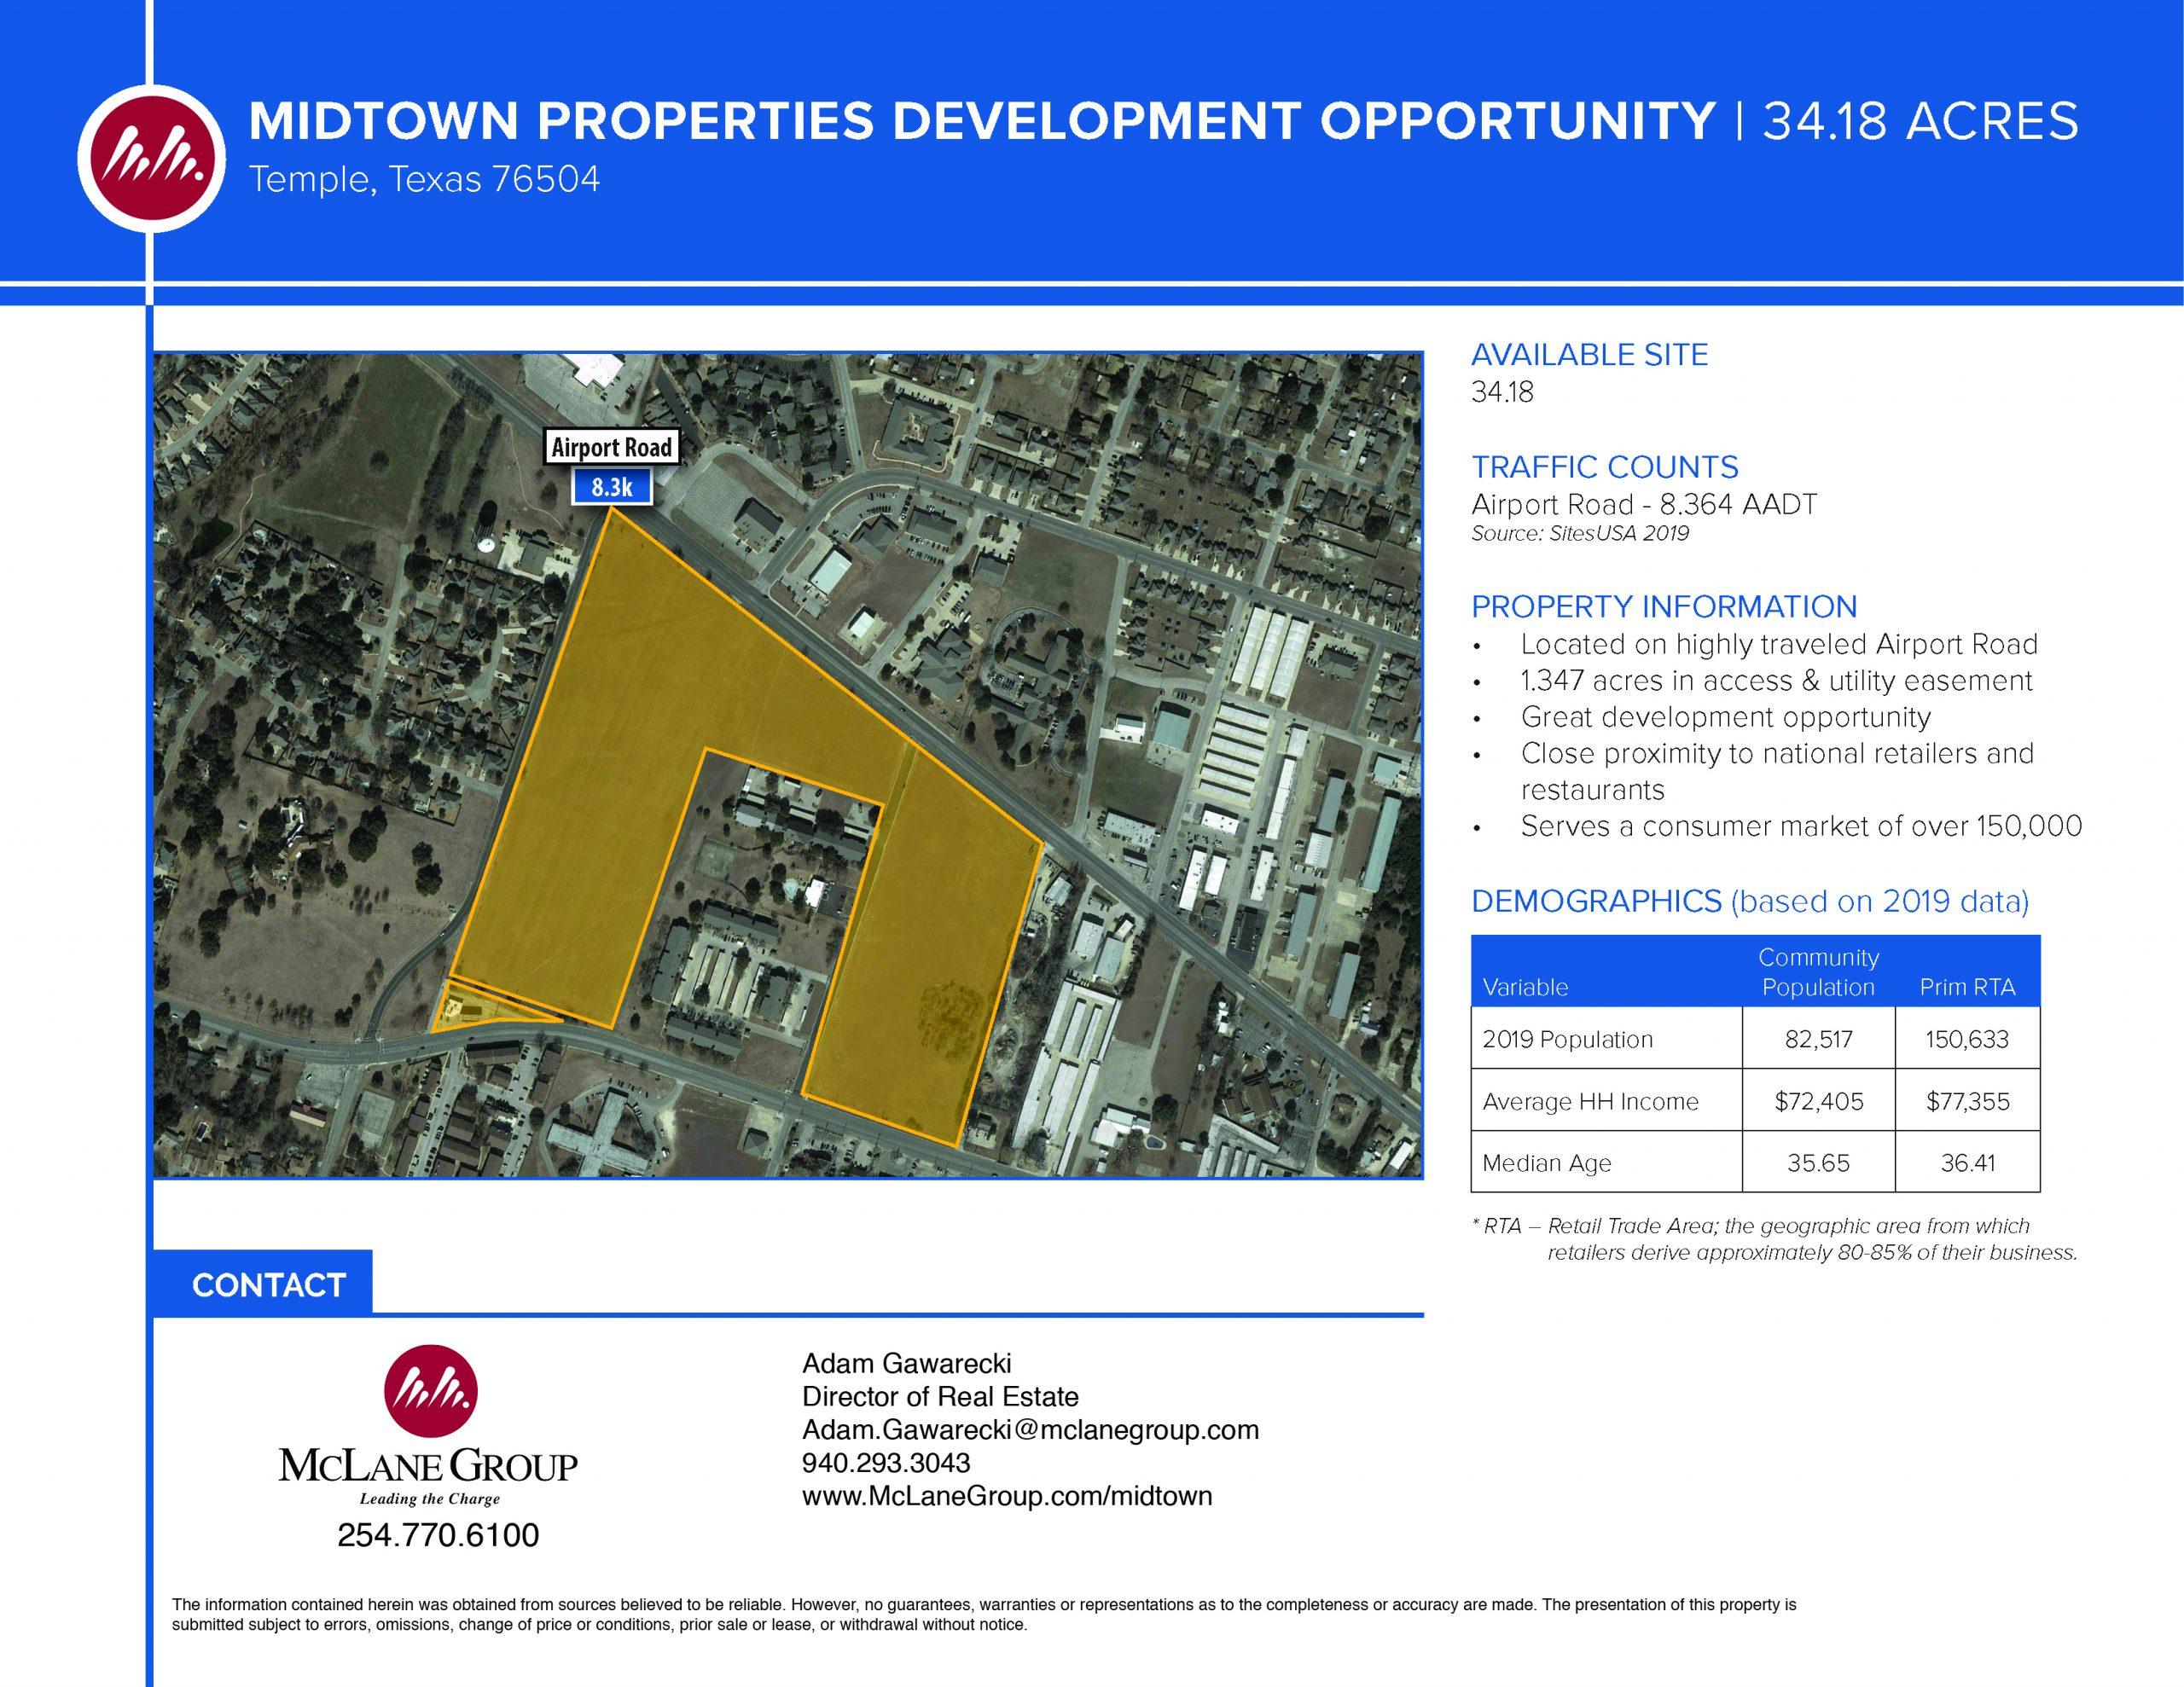 Midtown retail development property